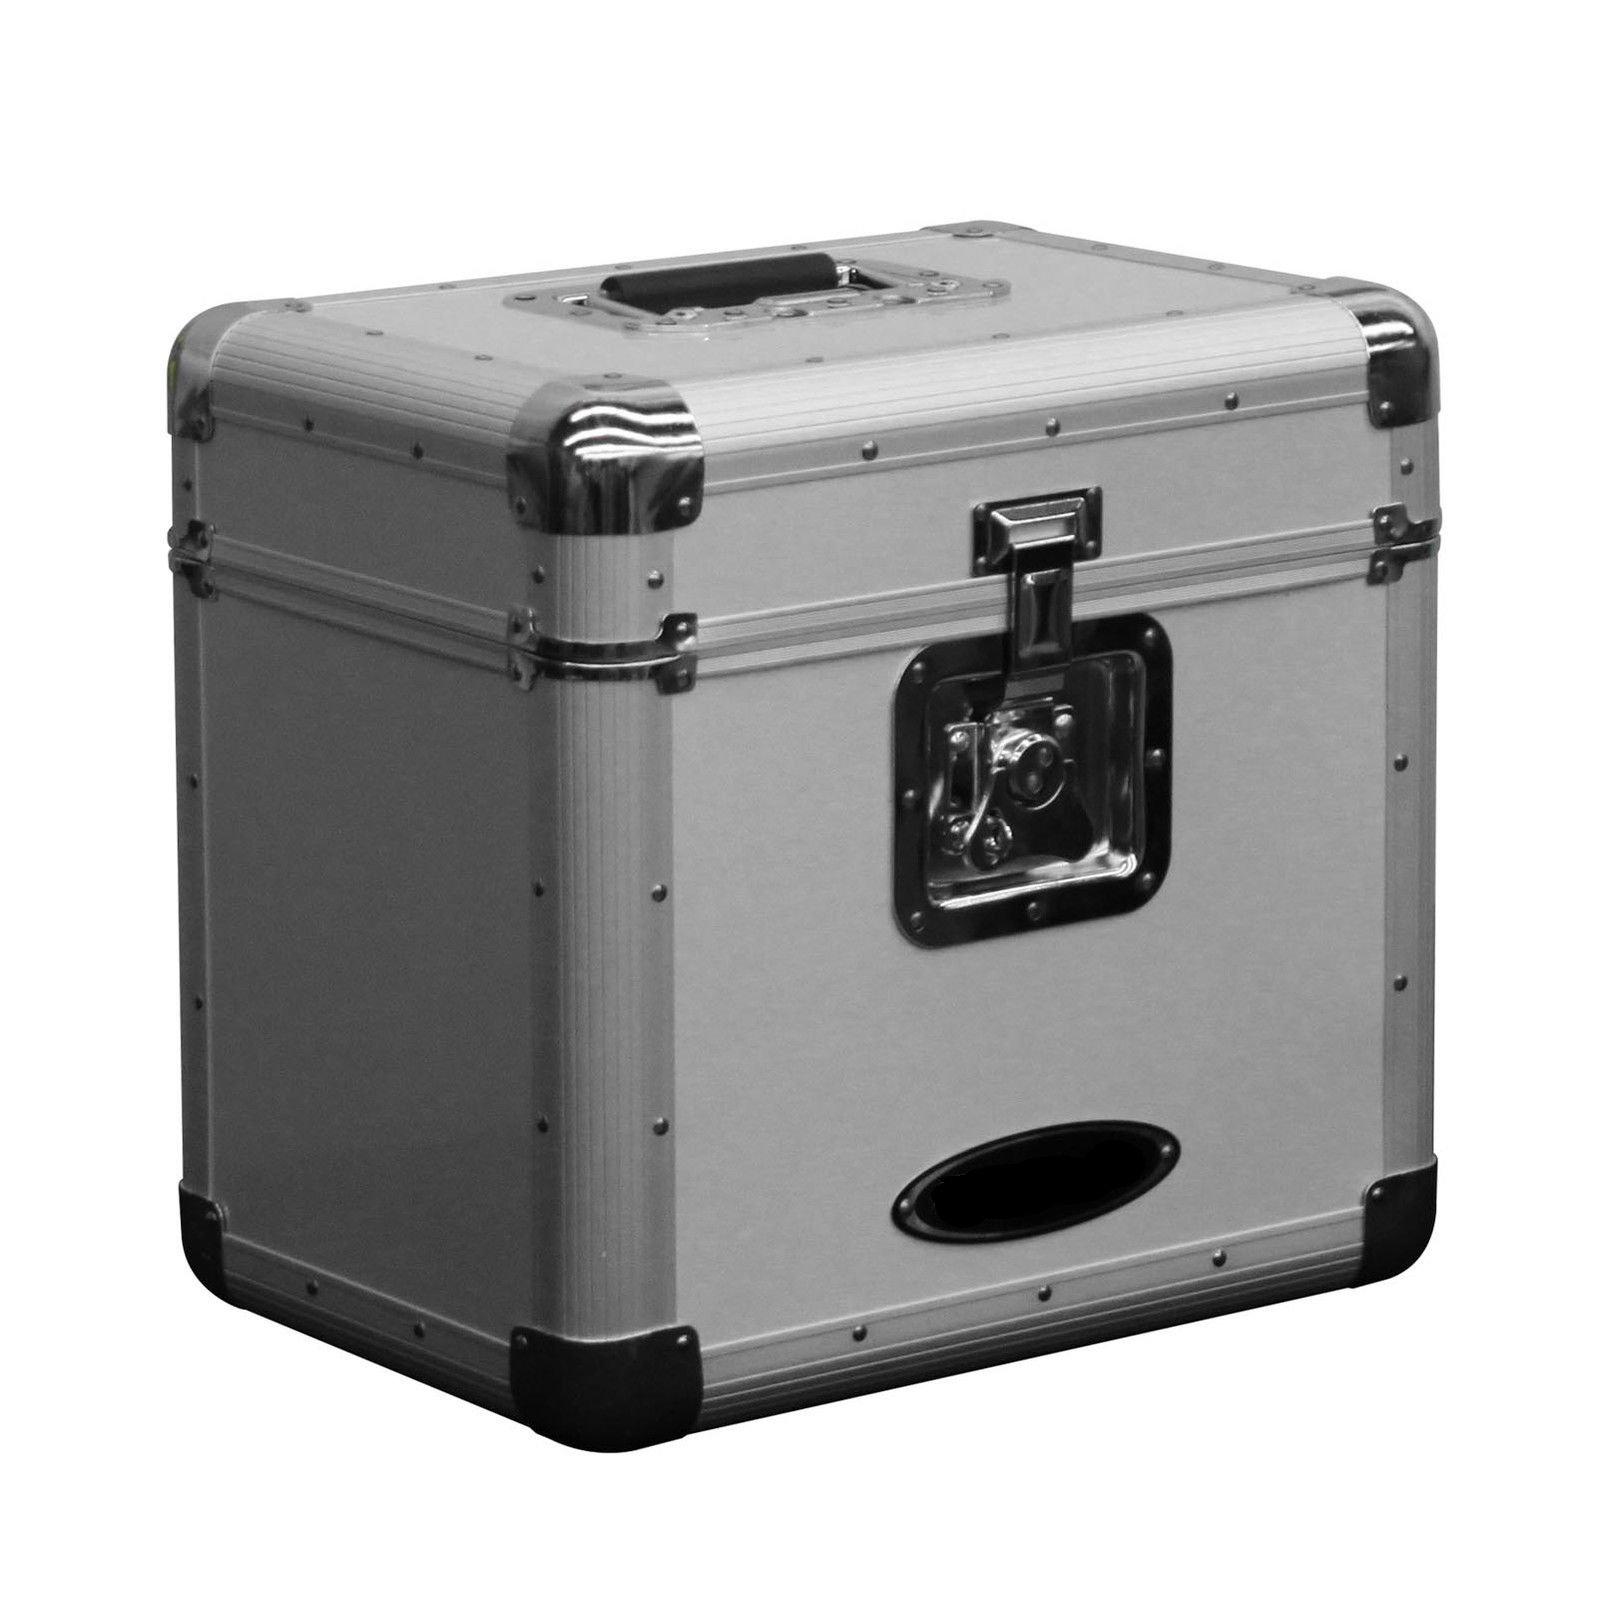 Vinyl Storage Silver Box Transfer 12'' LP Vinyl Records Stacking Utility Krom Transport Travel Lockable Case - Skroutz